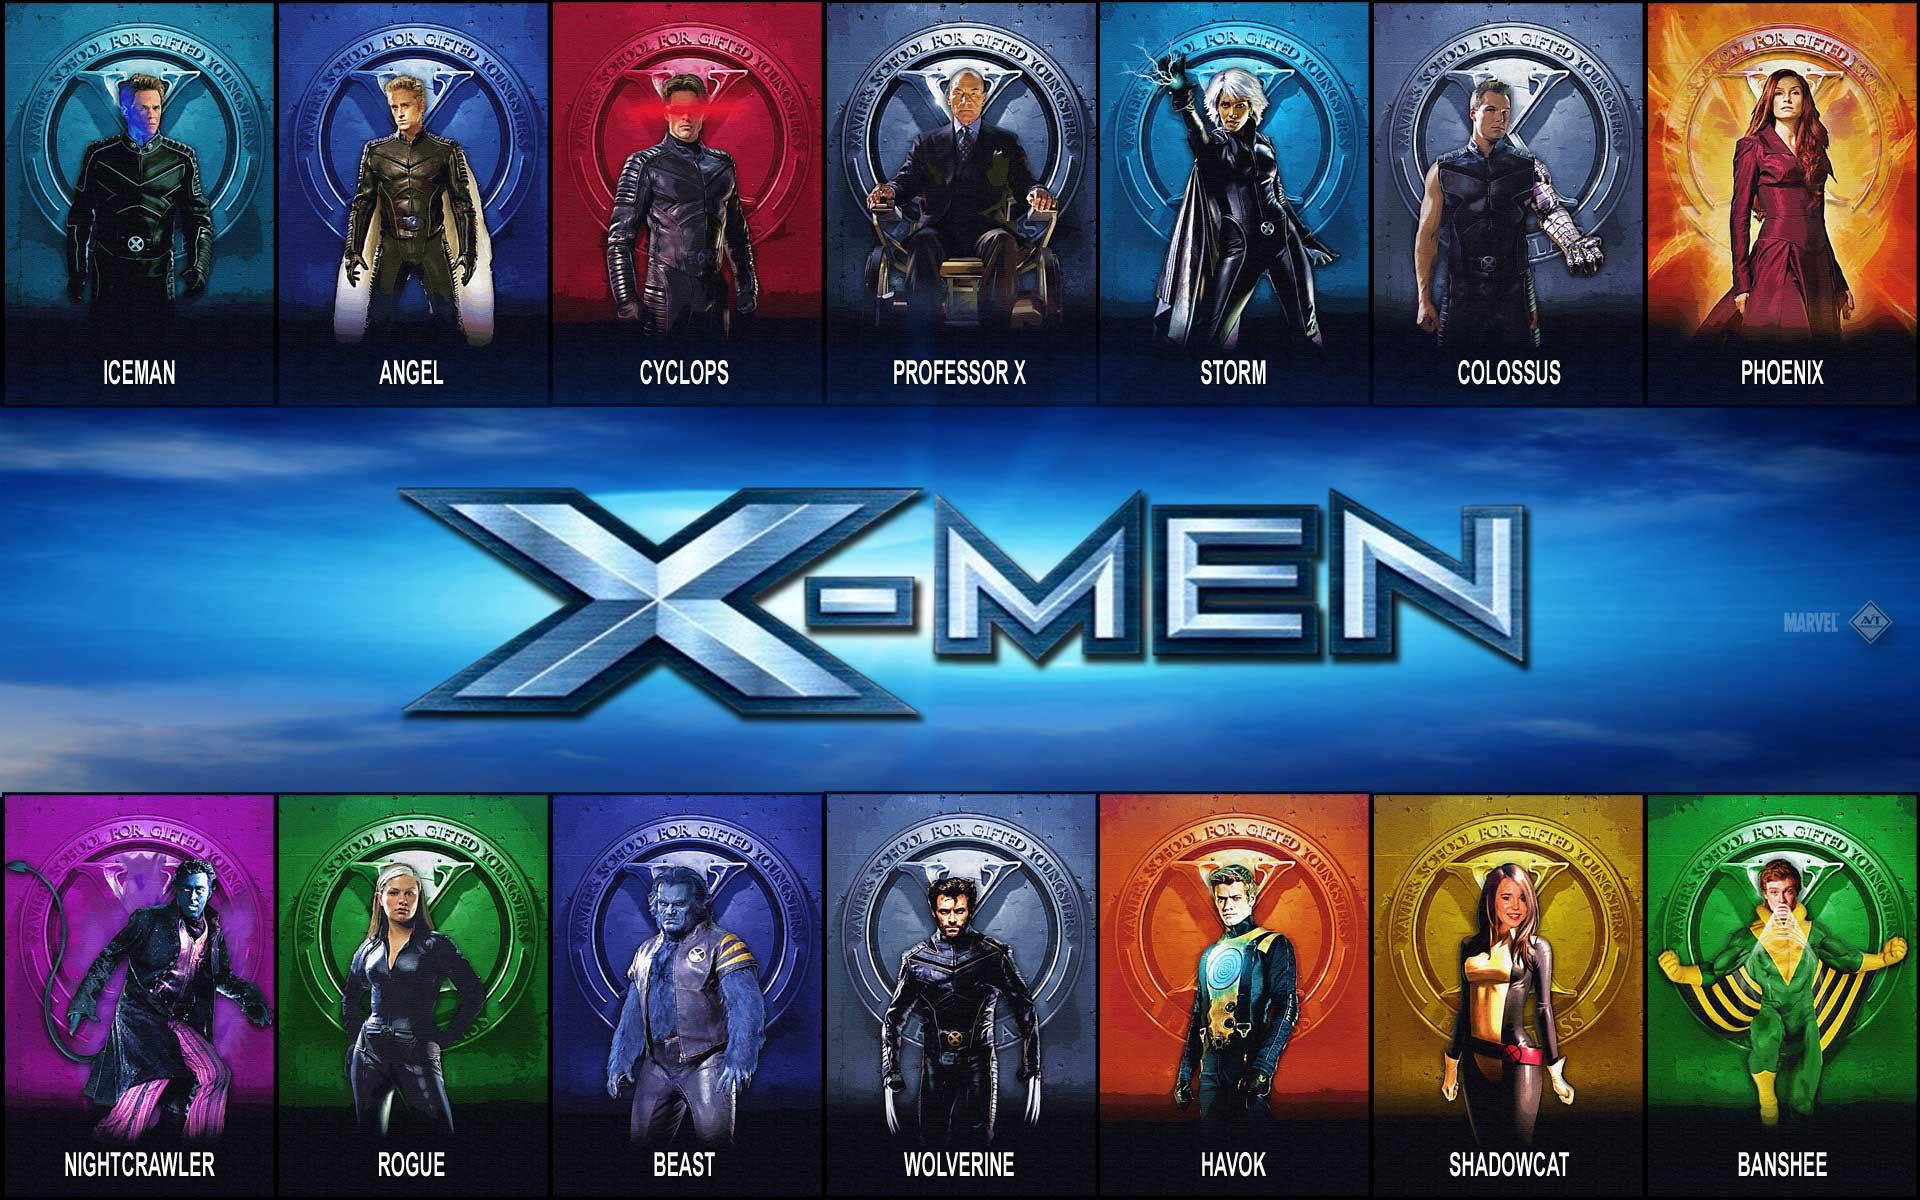 XMen Origins Wolverine HD Wallpapers Backgrounds